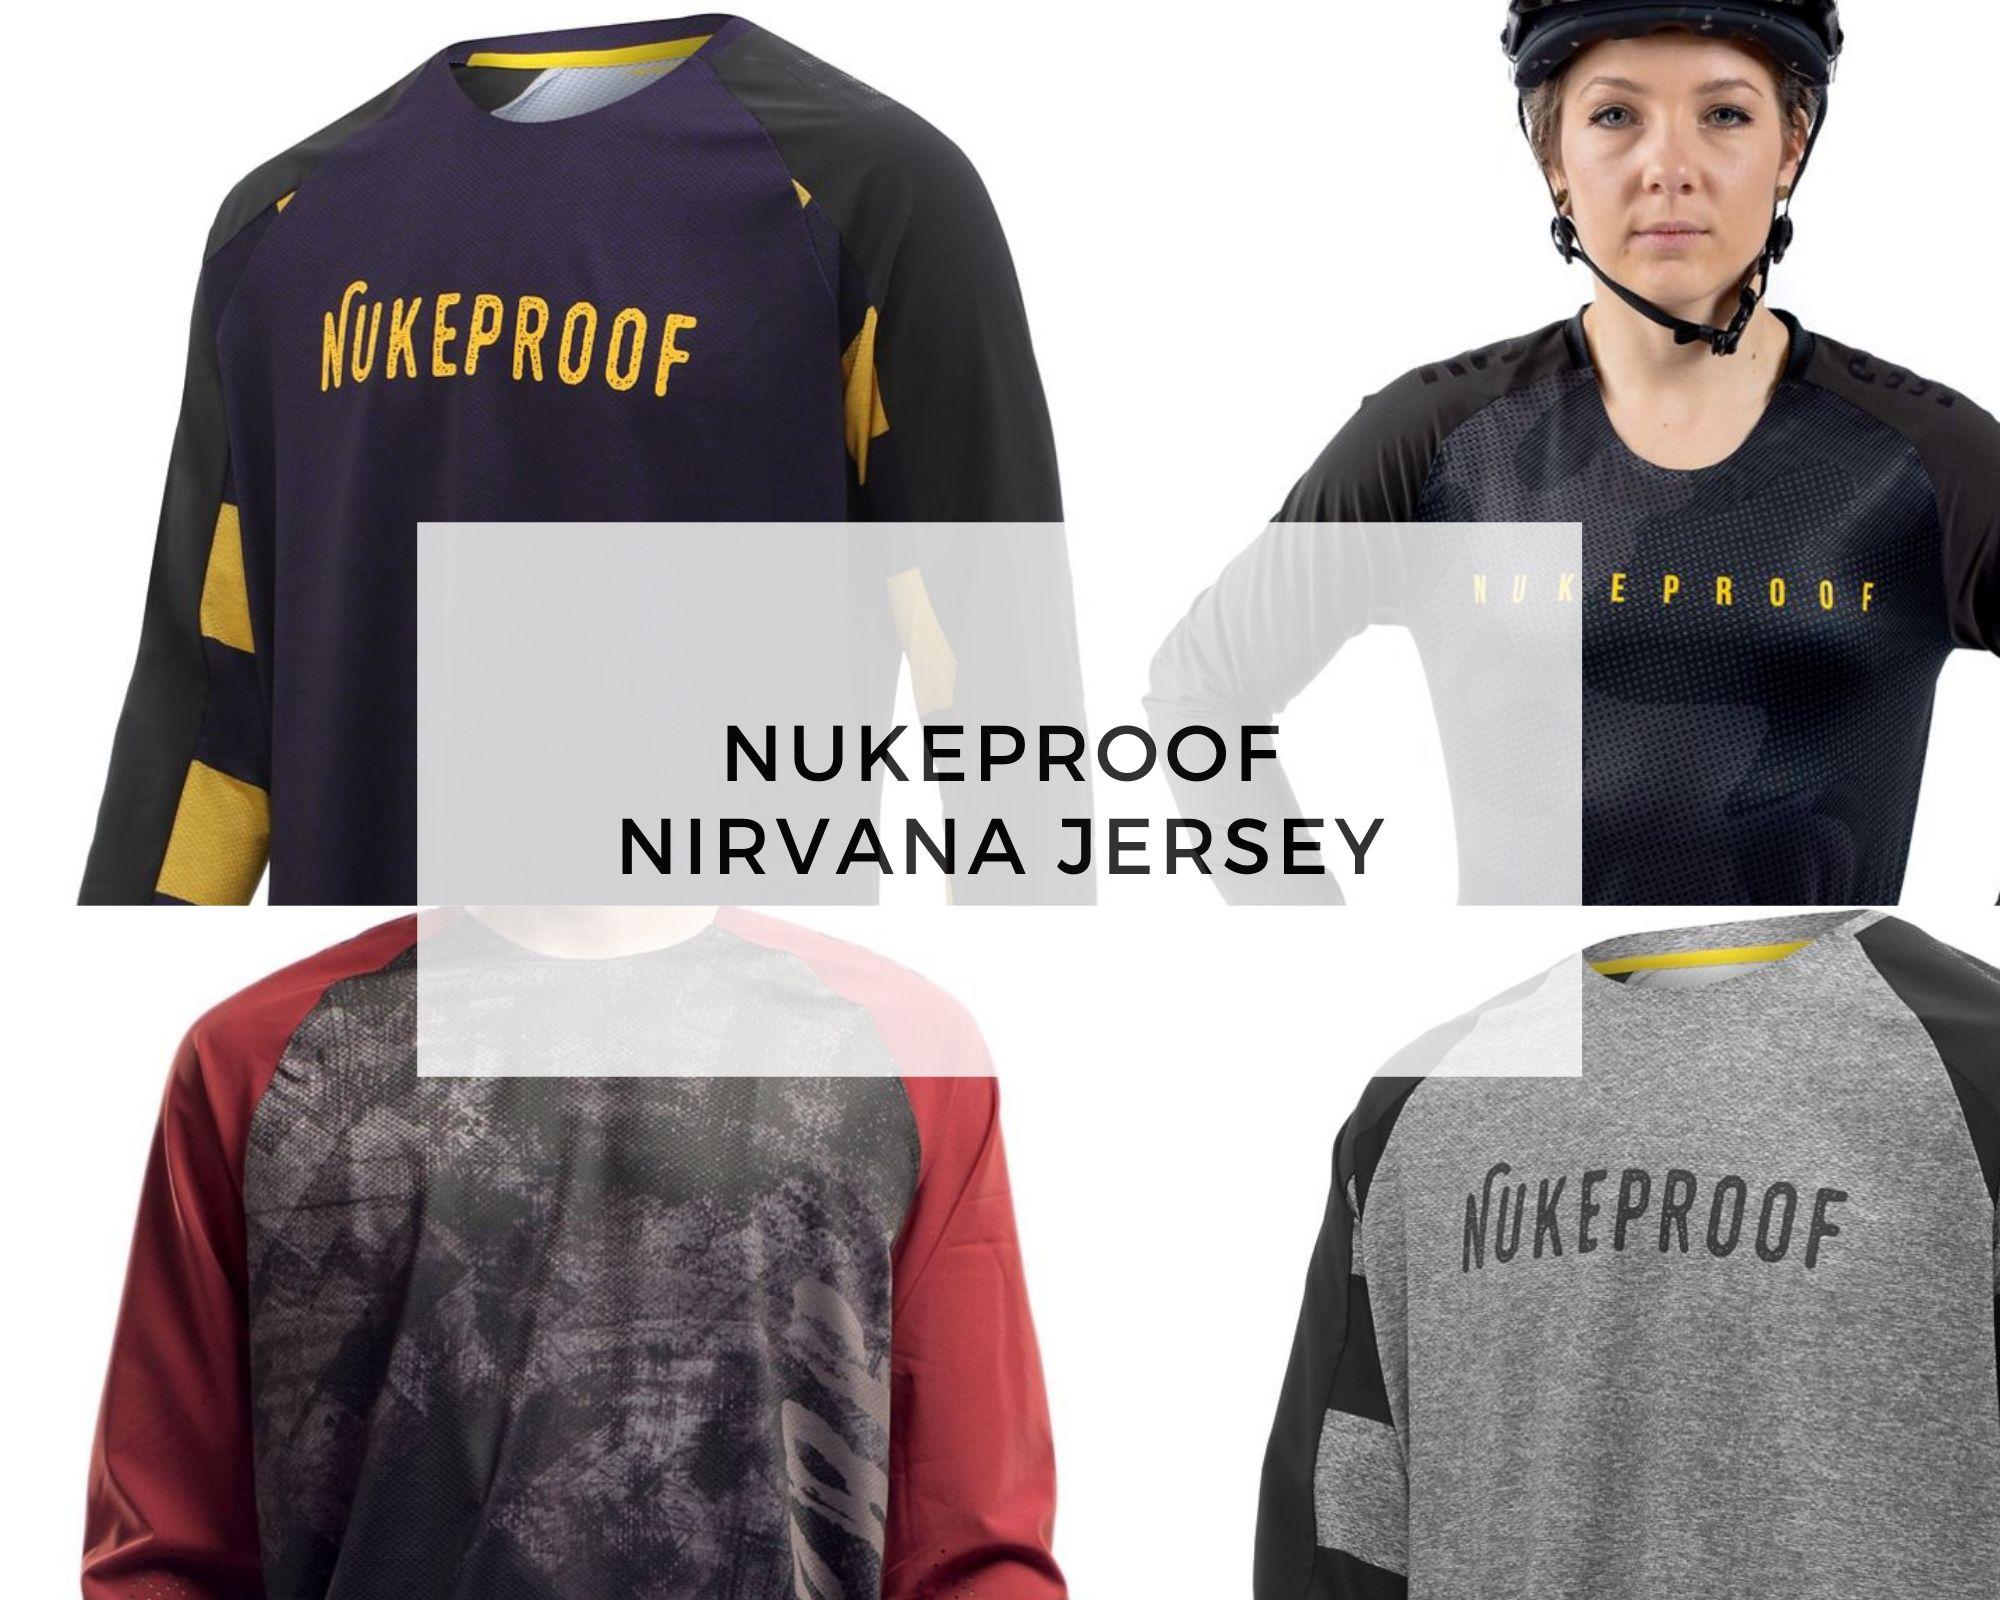 Nukeproof Jersey - nirvana cover